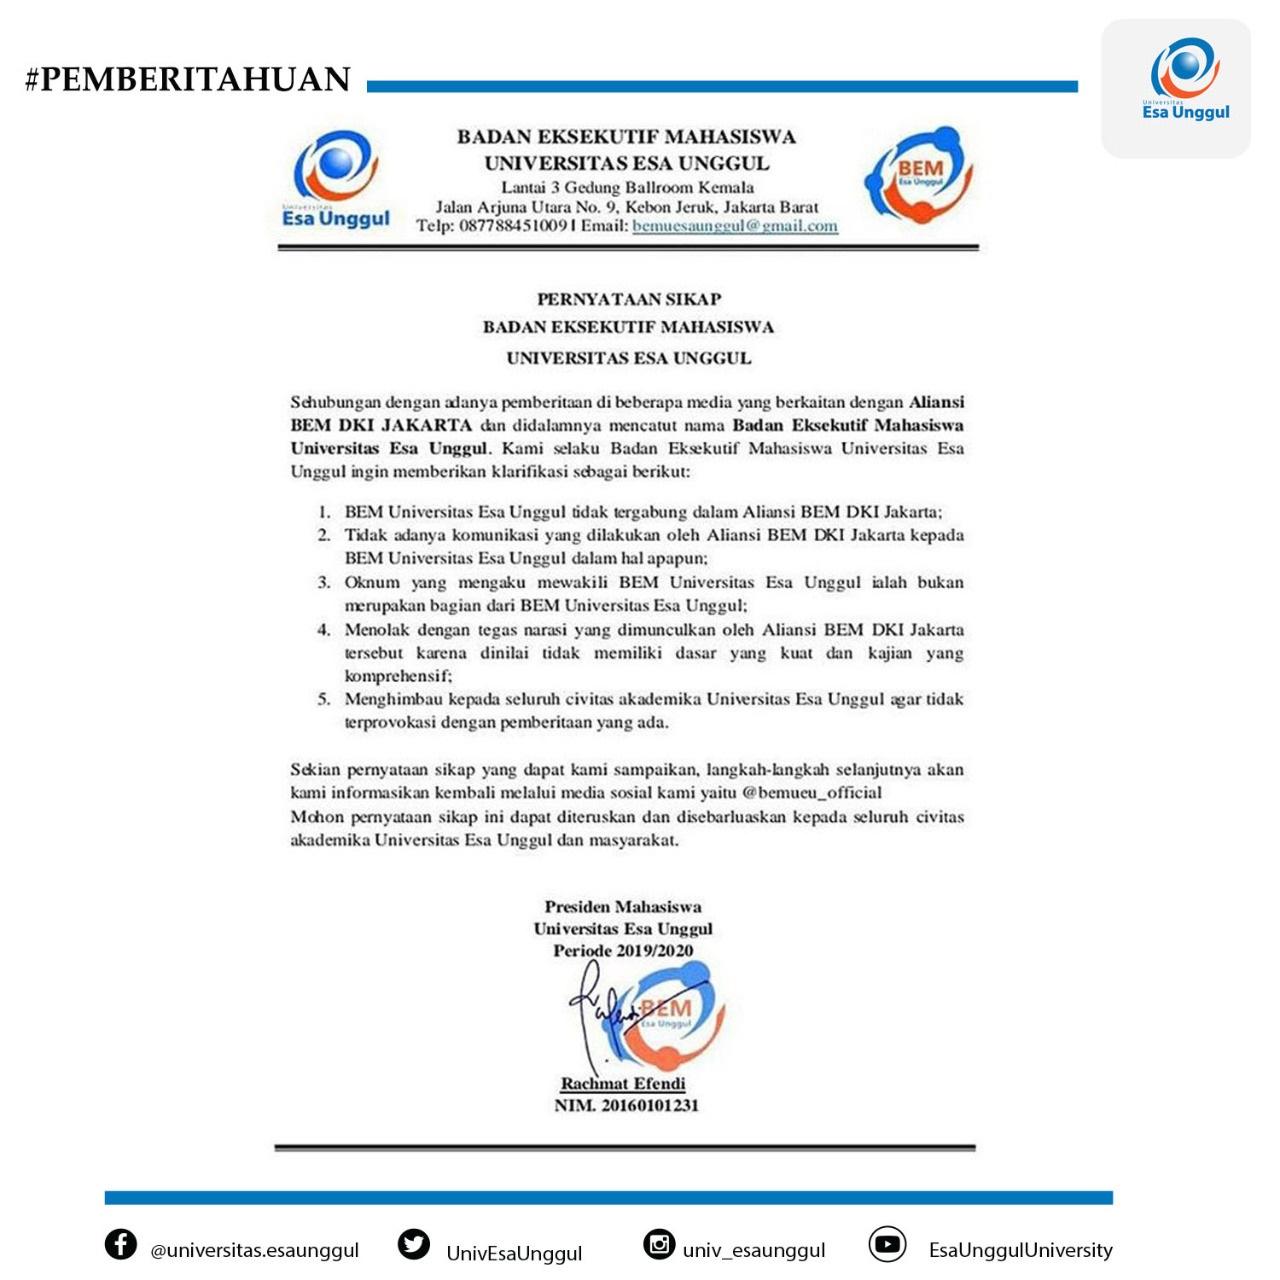 Pernyataan Sikap Badan Eksekutif Mahasiswa Universitas Esa Unggul Mengenai Aliansi BEM DKI Jakarta